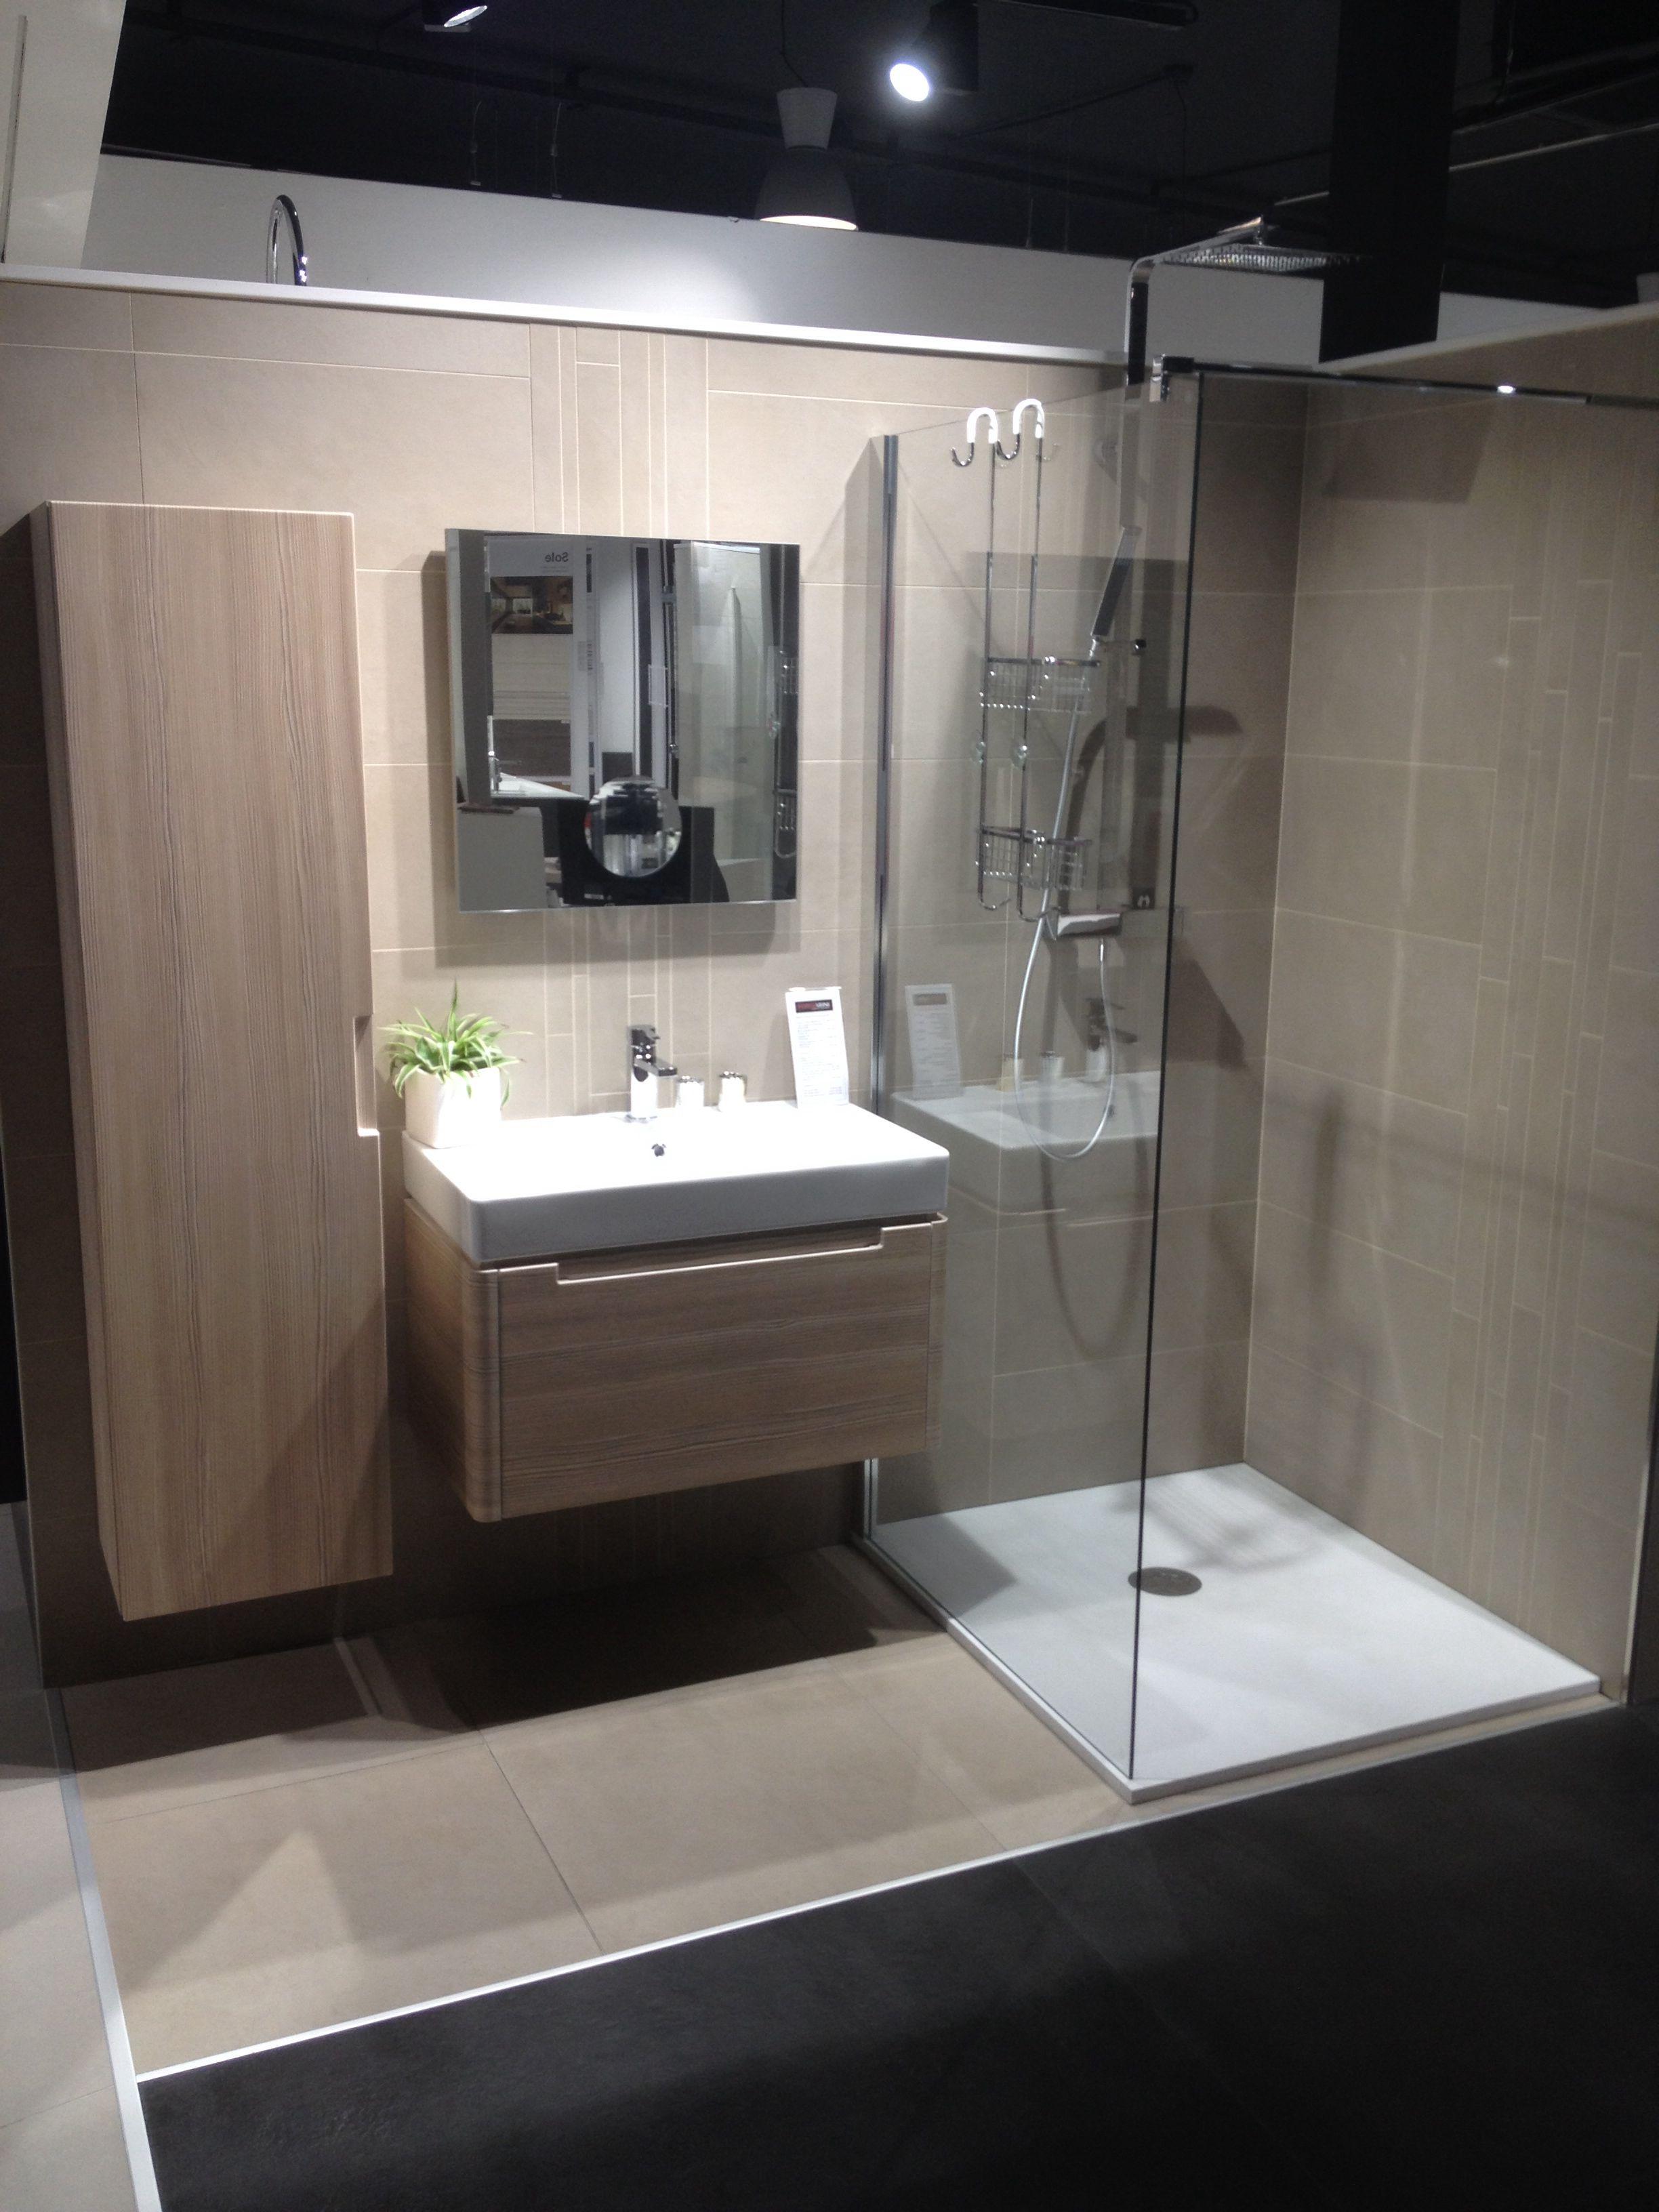 alsace carreaux strasbourg alsace carreaux finest with. Black Bedroom Furniture Sets. Home Design Ideas